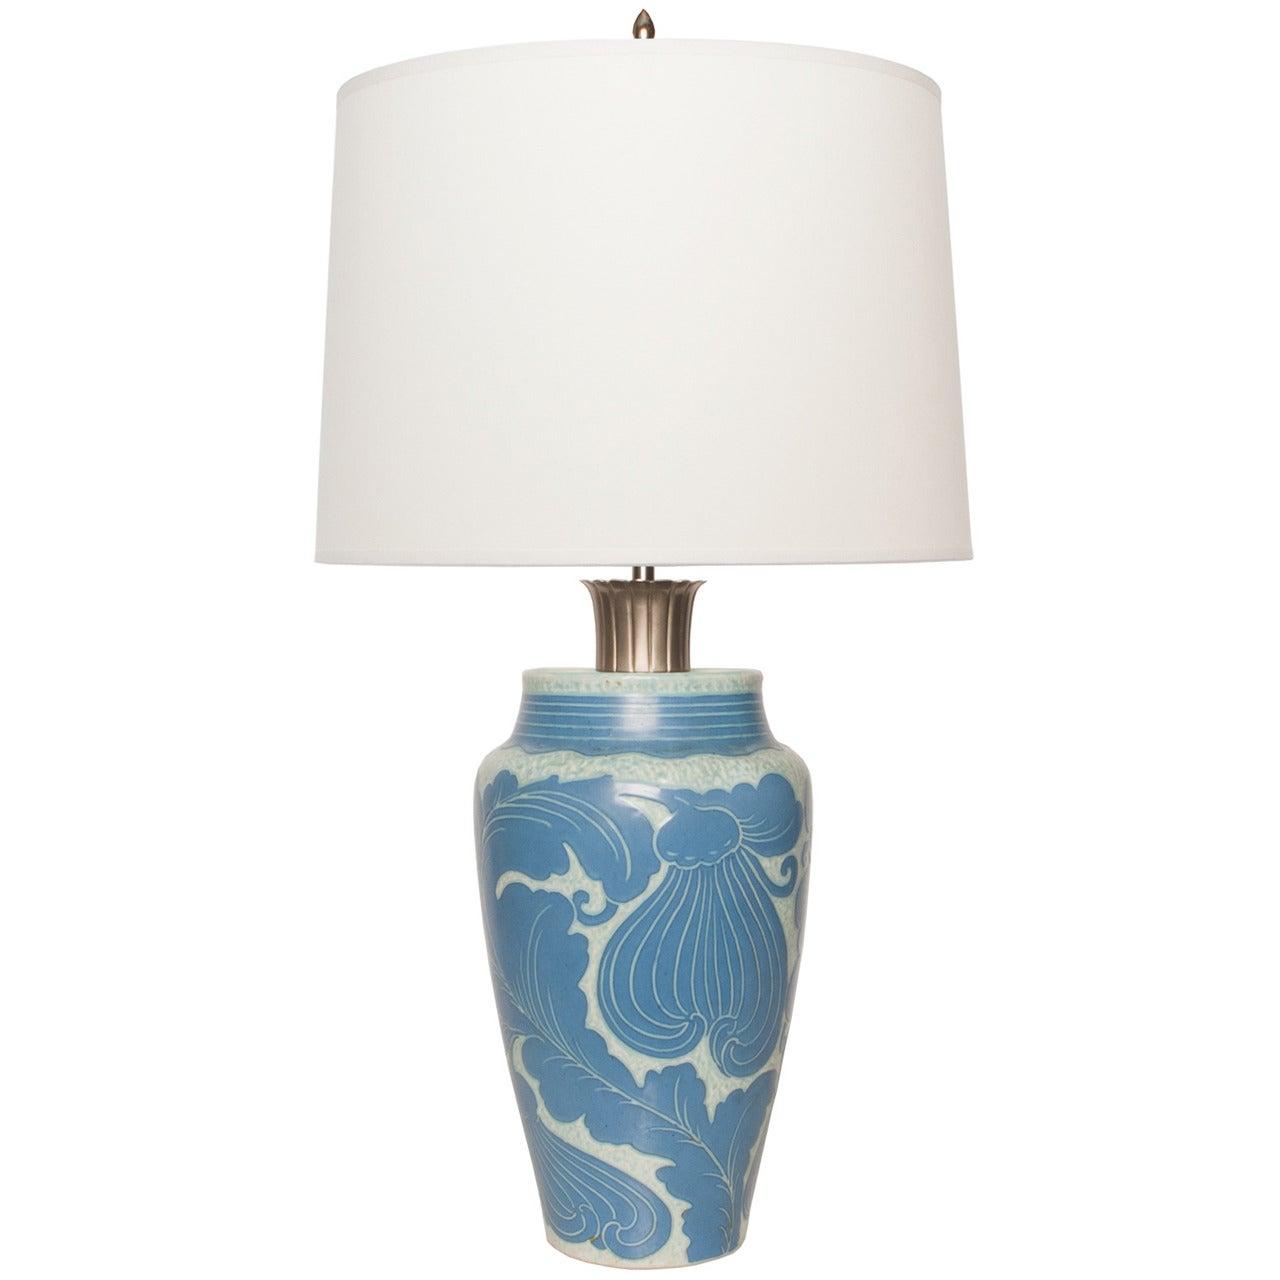 Josef Ekberg Lamp for Gustavsberg with Leaf Motif and Nickel Details